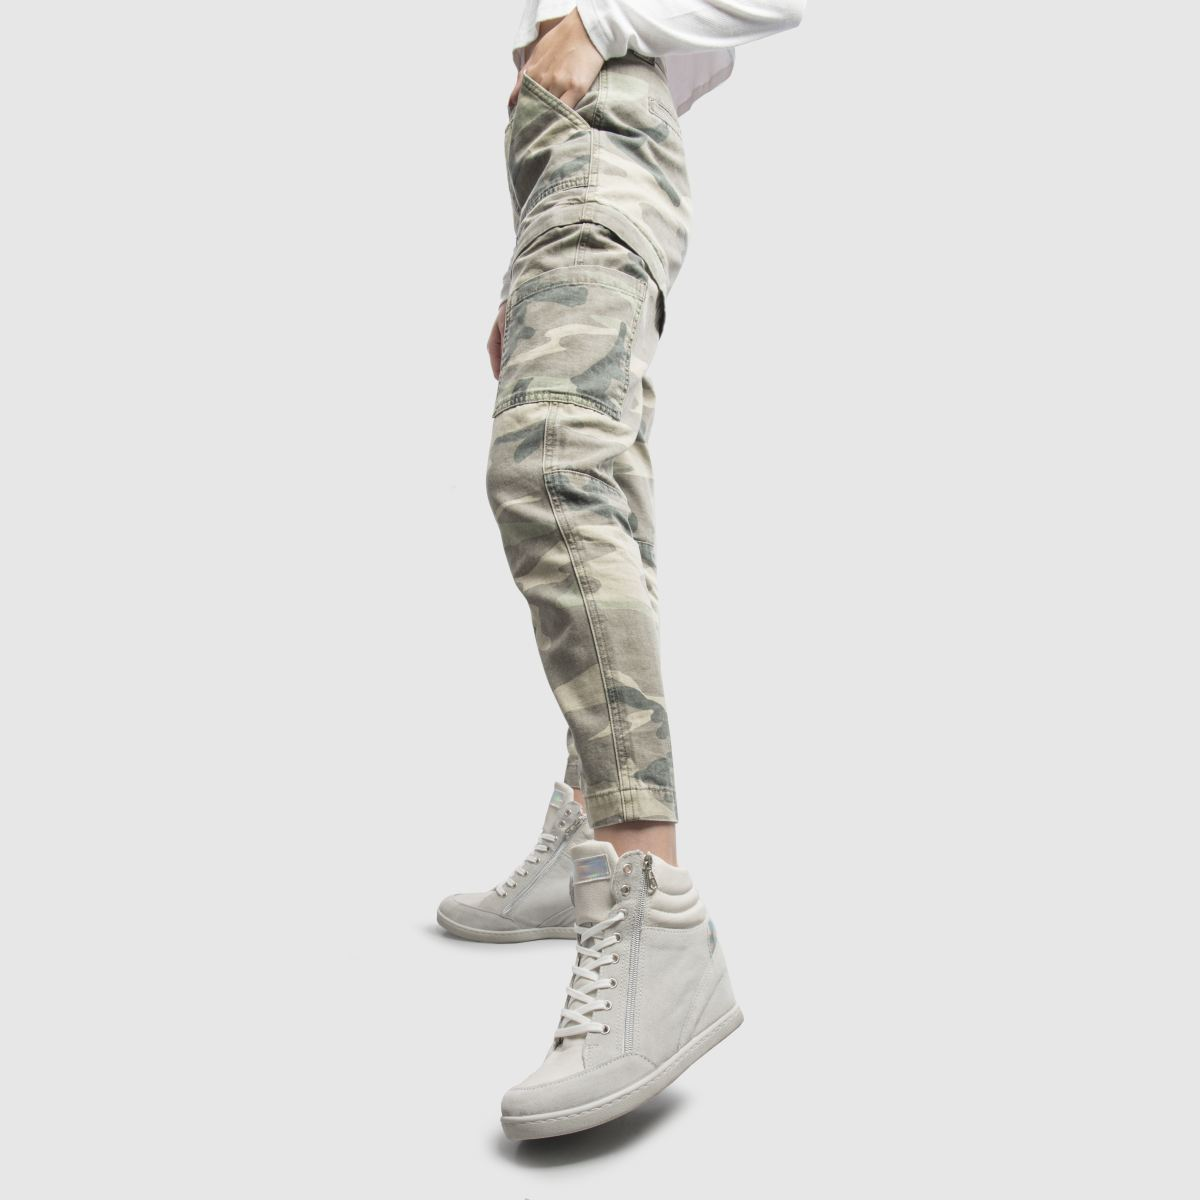 Damen Steingrau schuh Future Boots | schuh Gute Qualität beliebte Schuhe